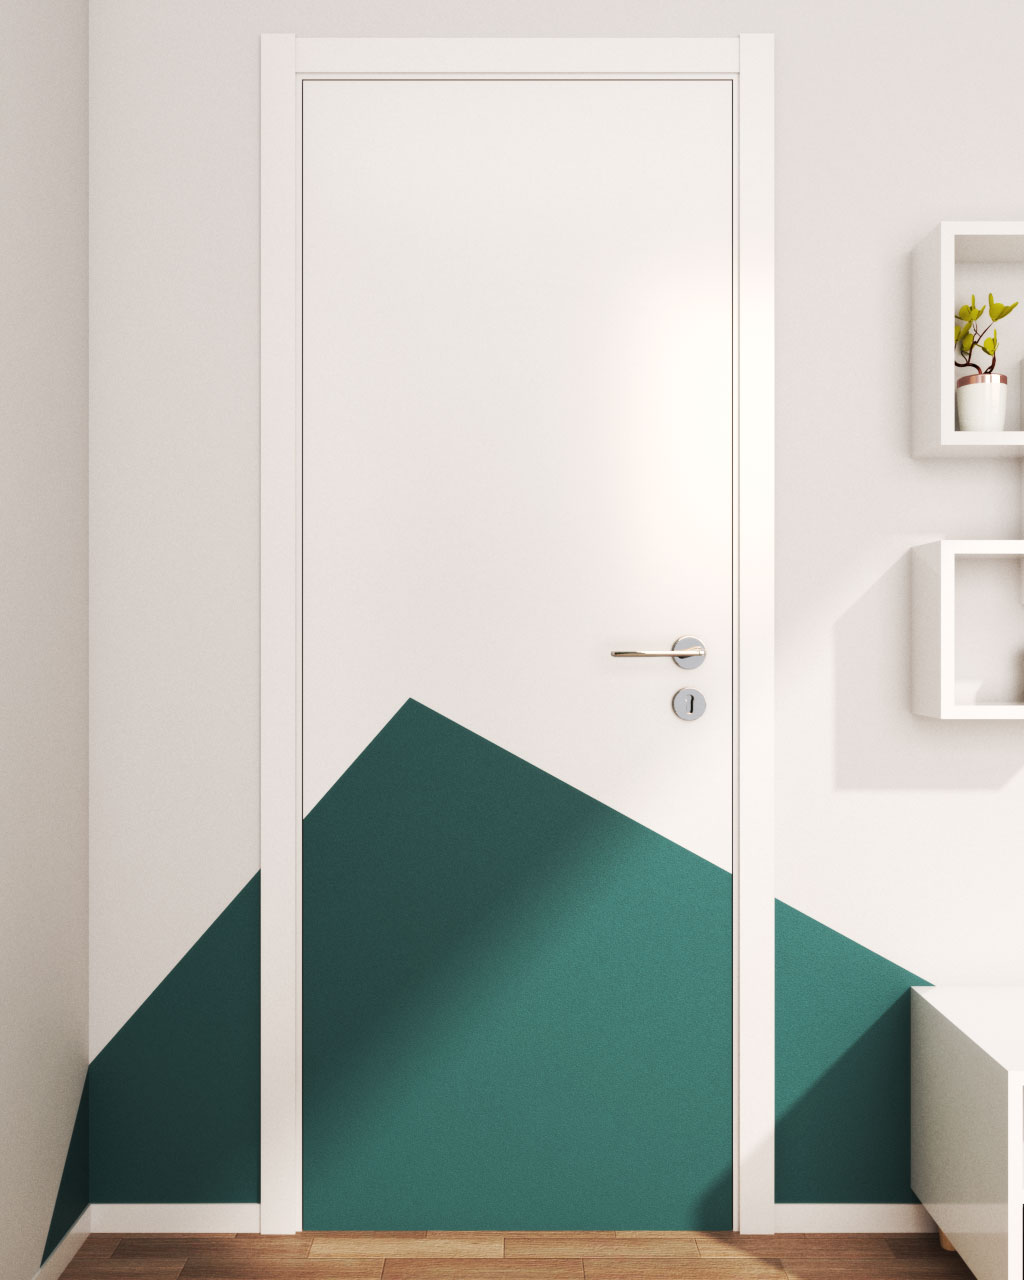 Repaint Bedroom Door using Geometric Pattern